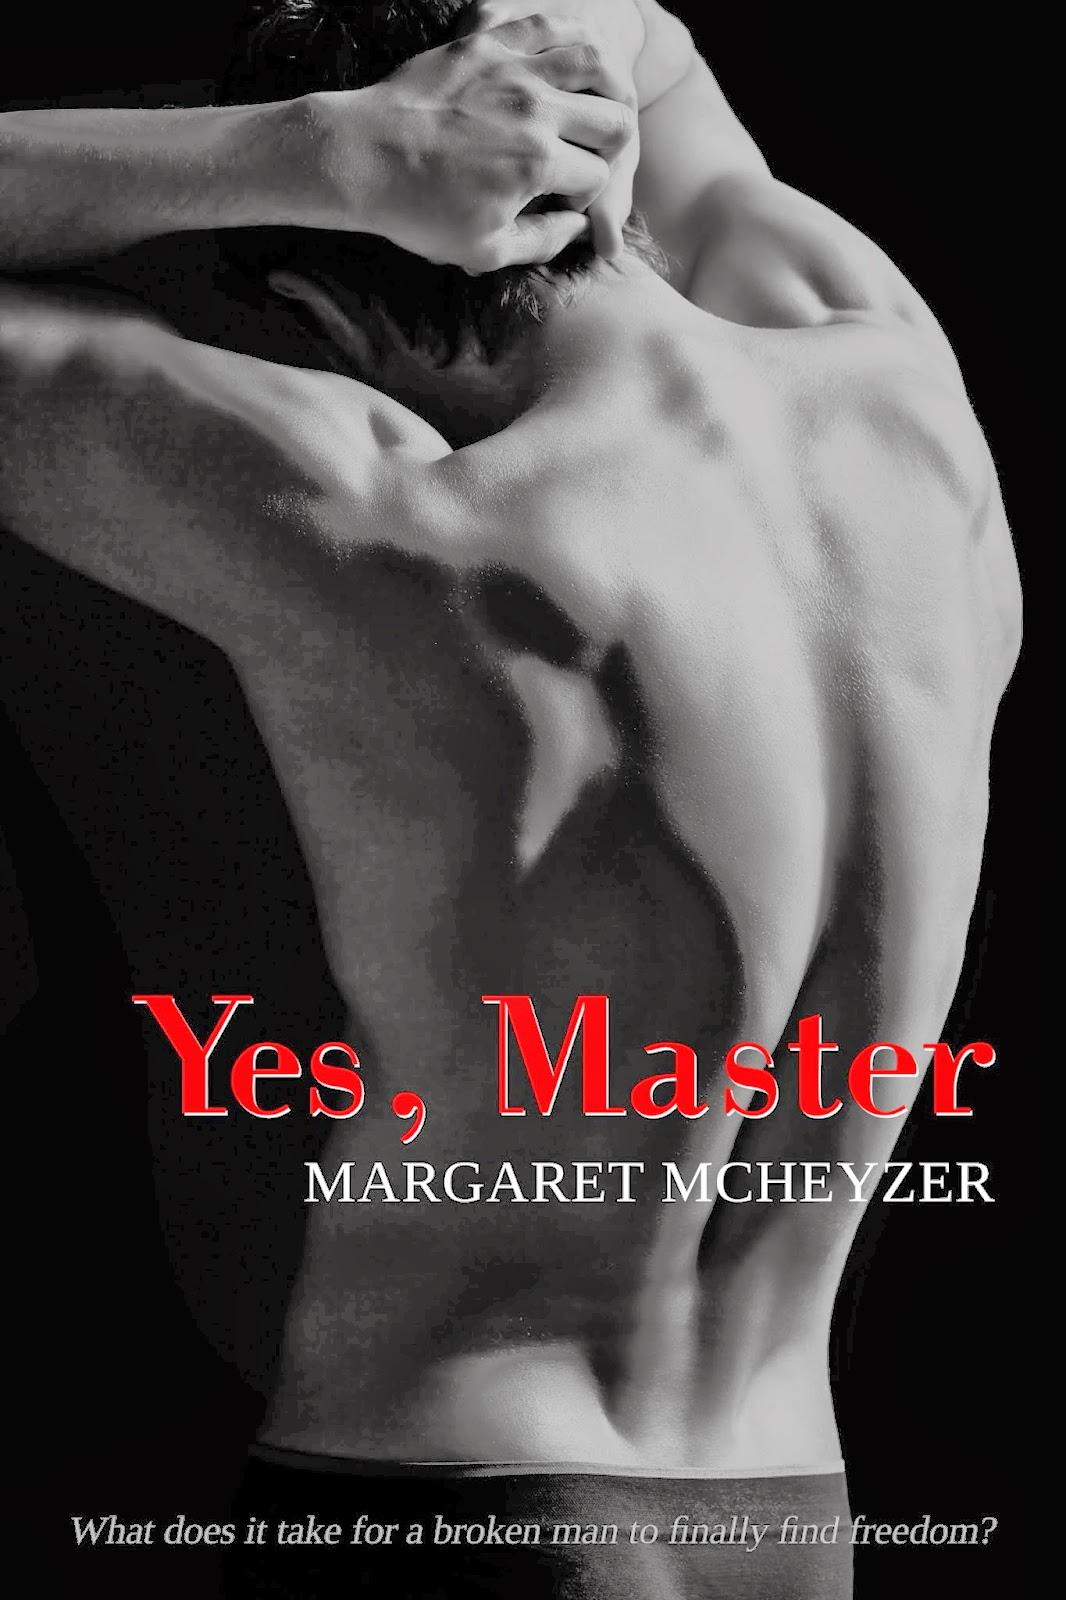 YES MASTER MARGARET MCHEYZER PDF DOWNLOAD